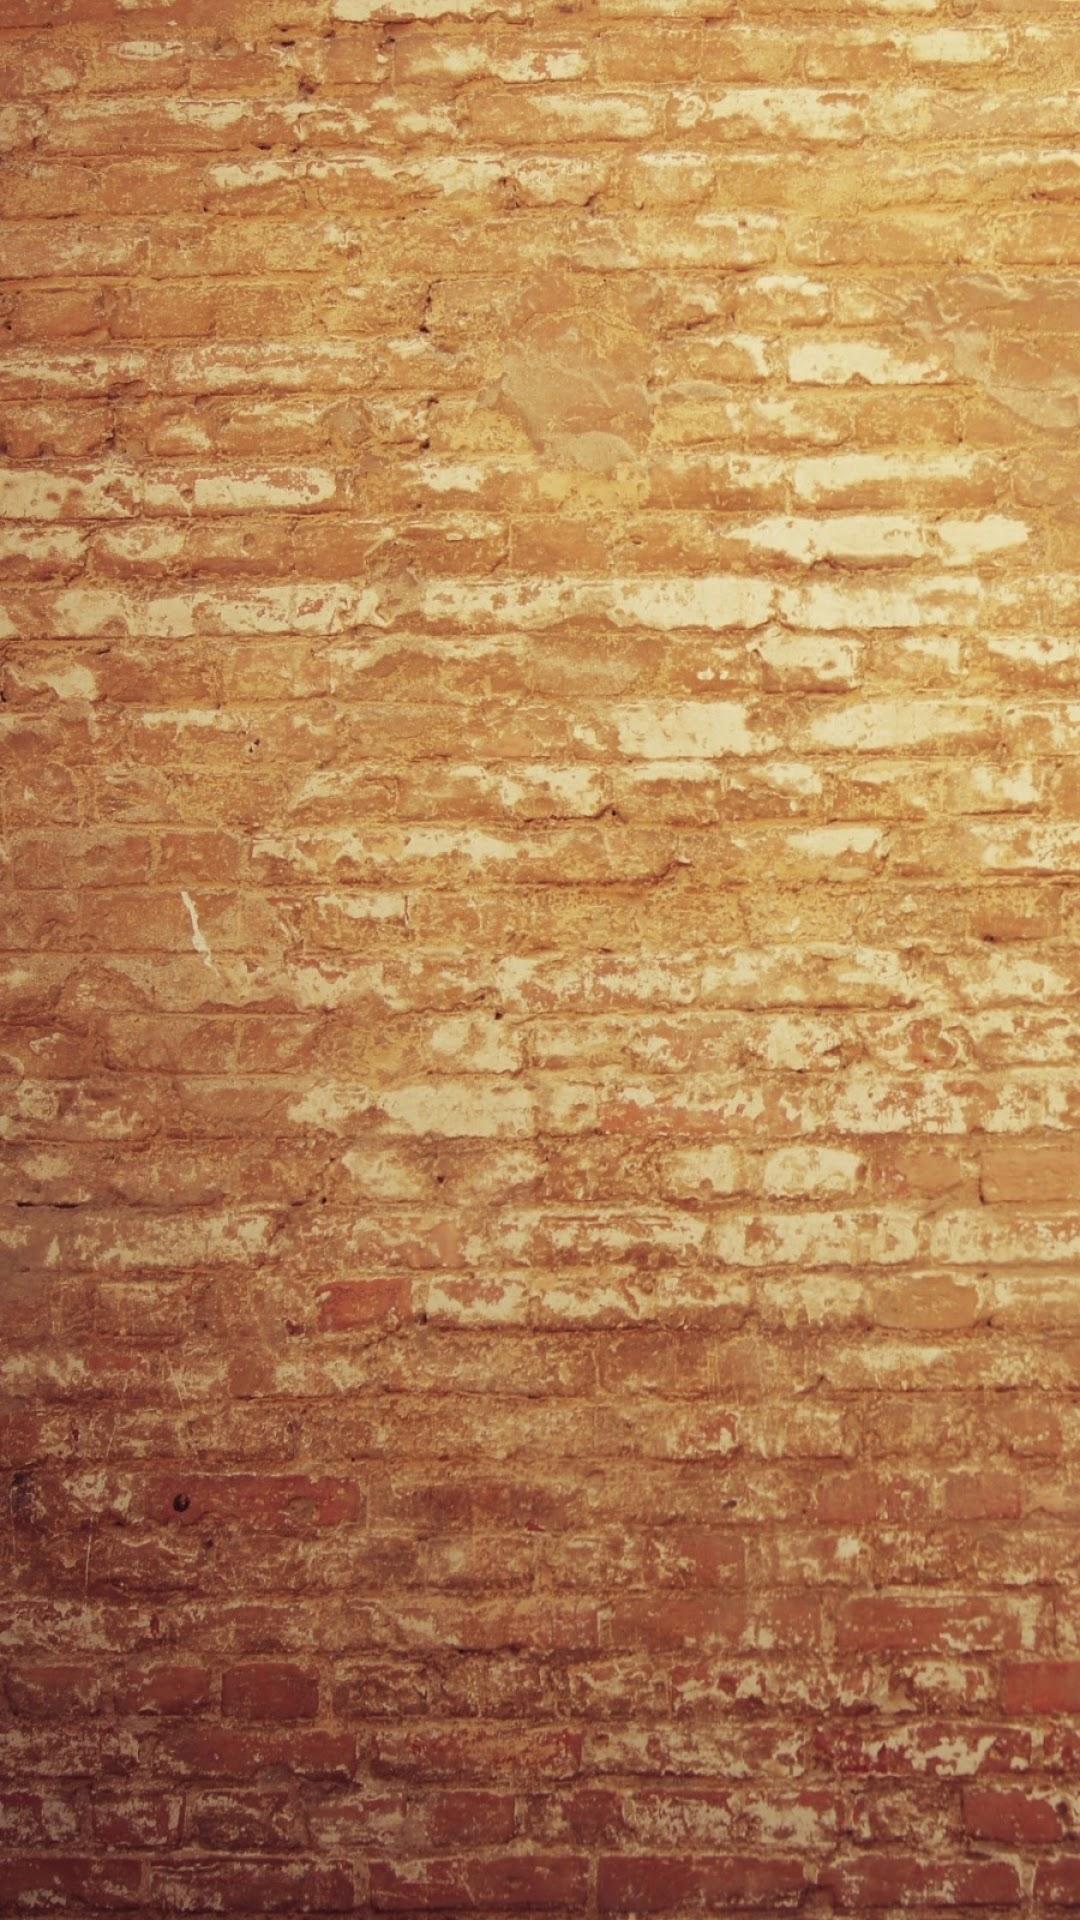 Galaxy Note HD Wallpapers Brick Wall Pattern Galaxy Note HD Wallpaper